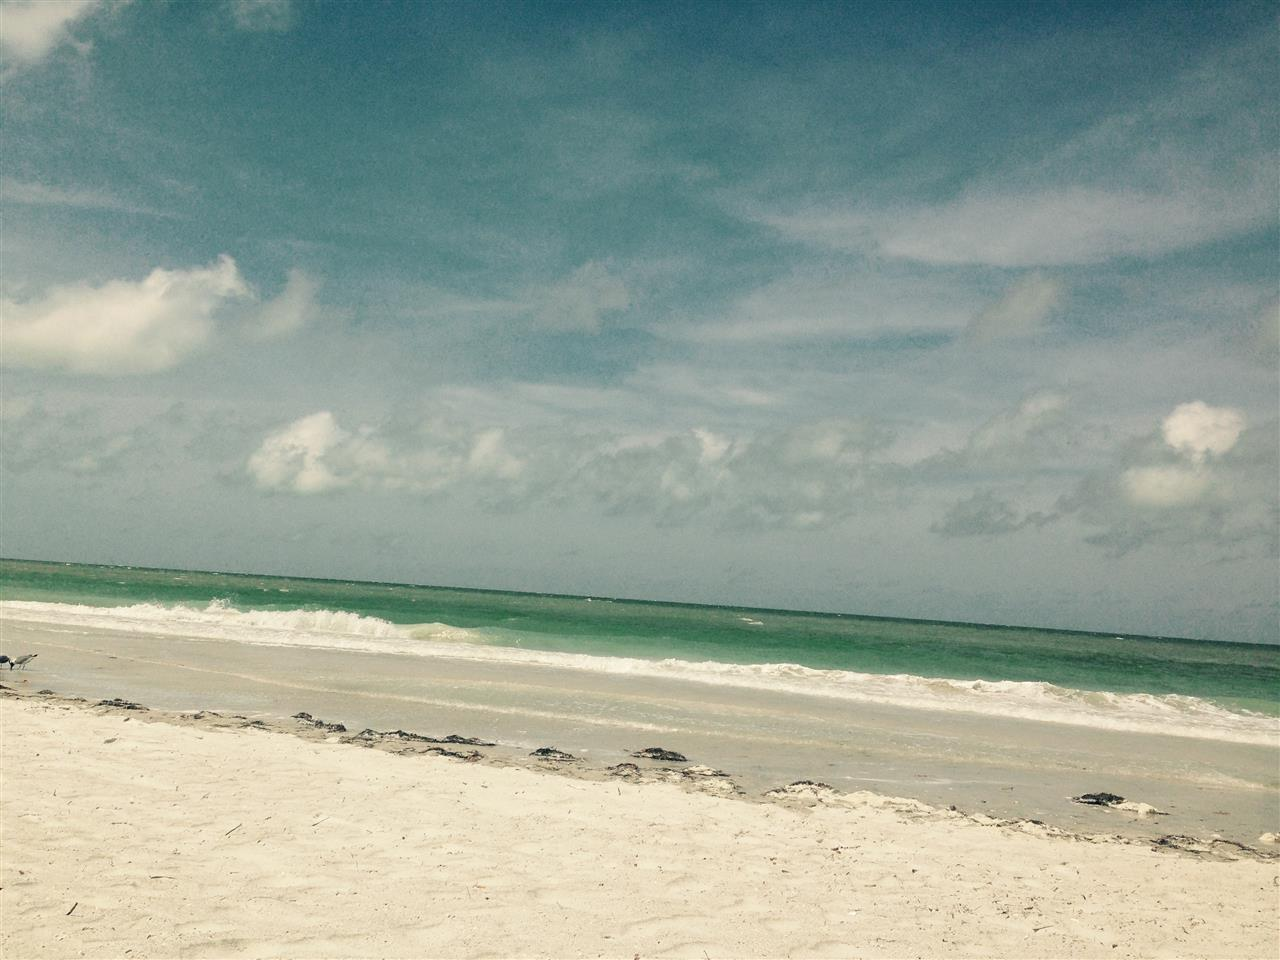 Beachin it in #IndianRocksBeach